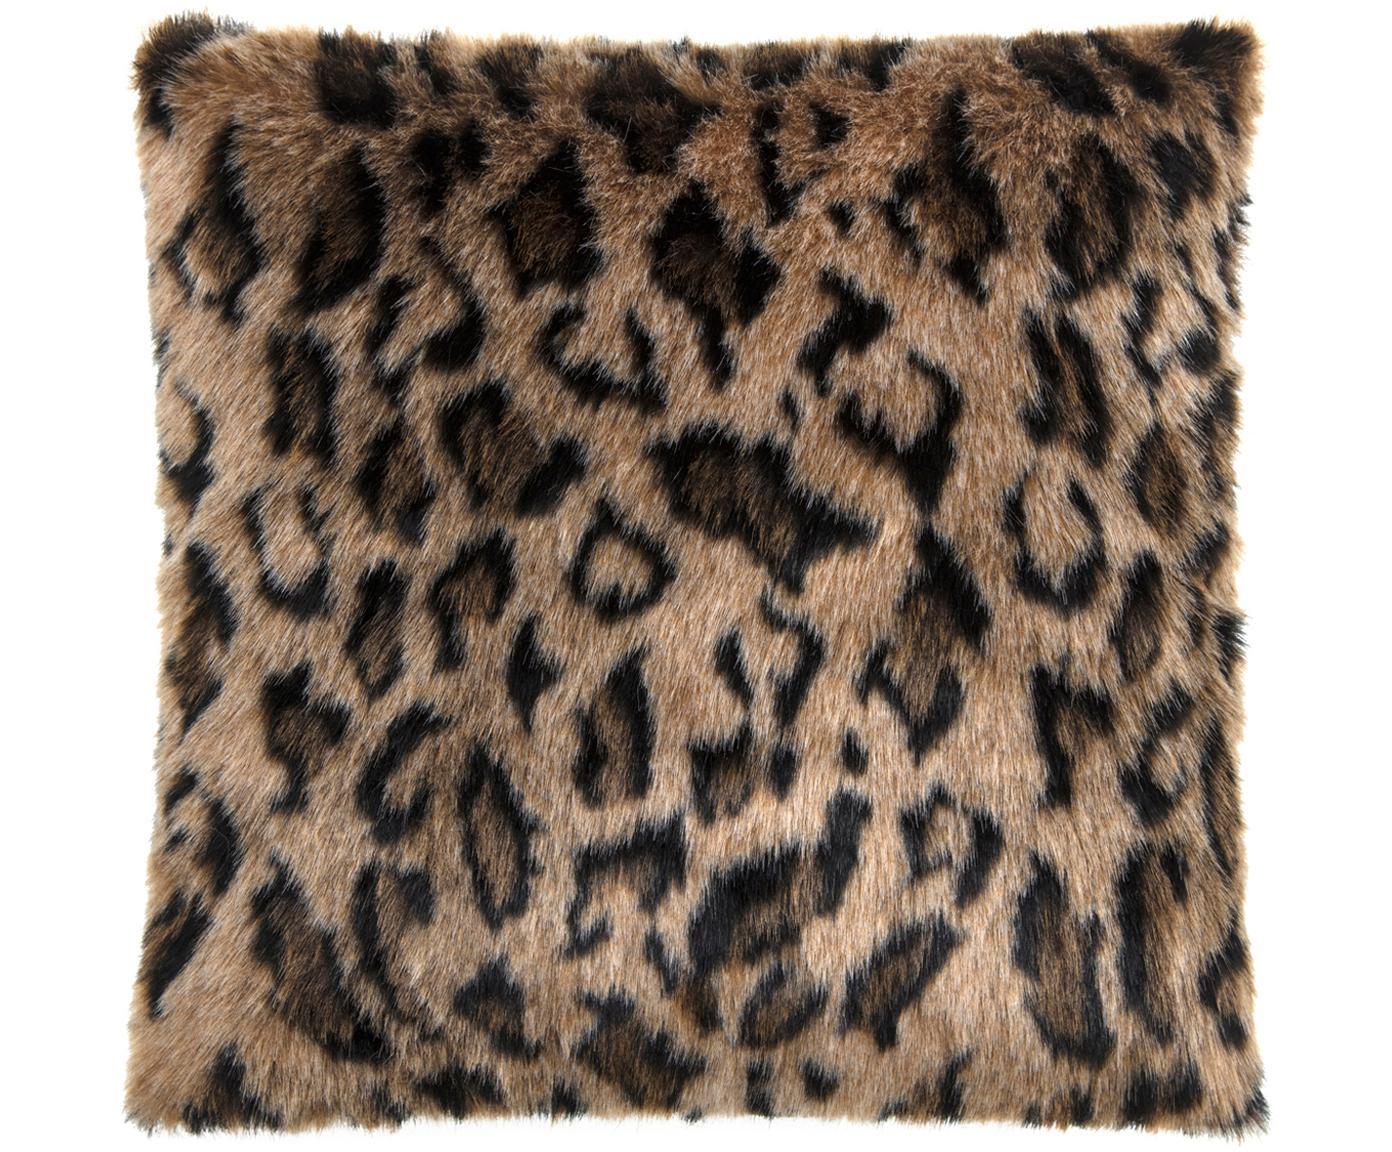 Funda de cojín de piel de leopardo sintética Leo, Parte delantera: 60%poliacrílico, 40%pol, Parte trasera: terciopelo de poliéster, Marrón, negro, An 40 x L 40 cm